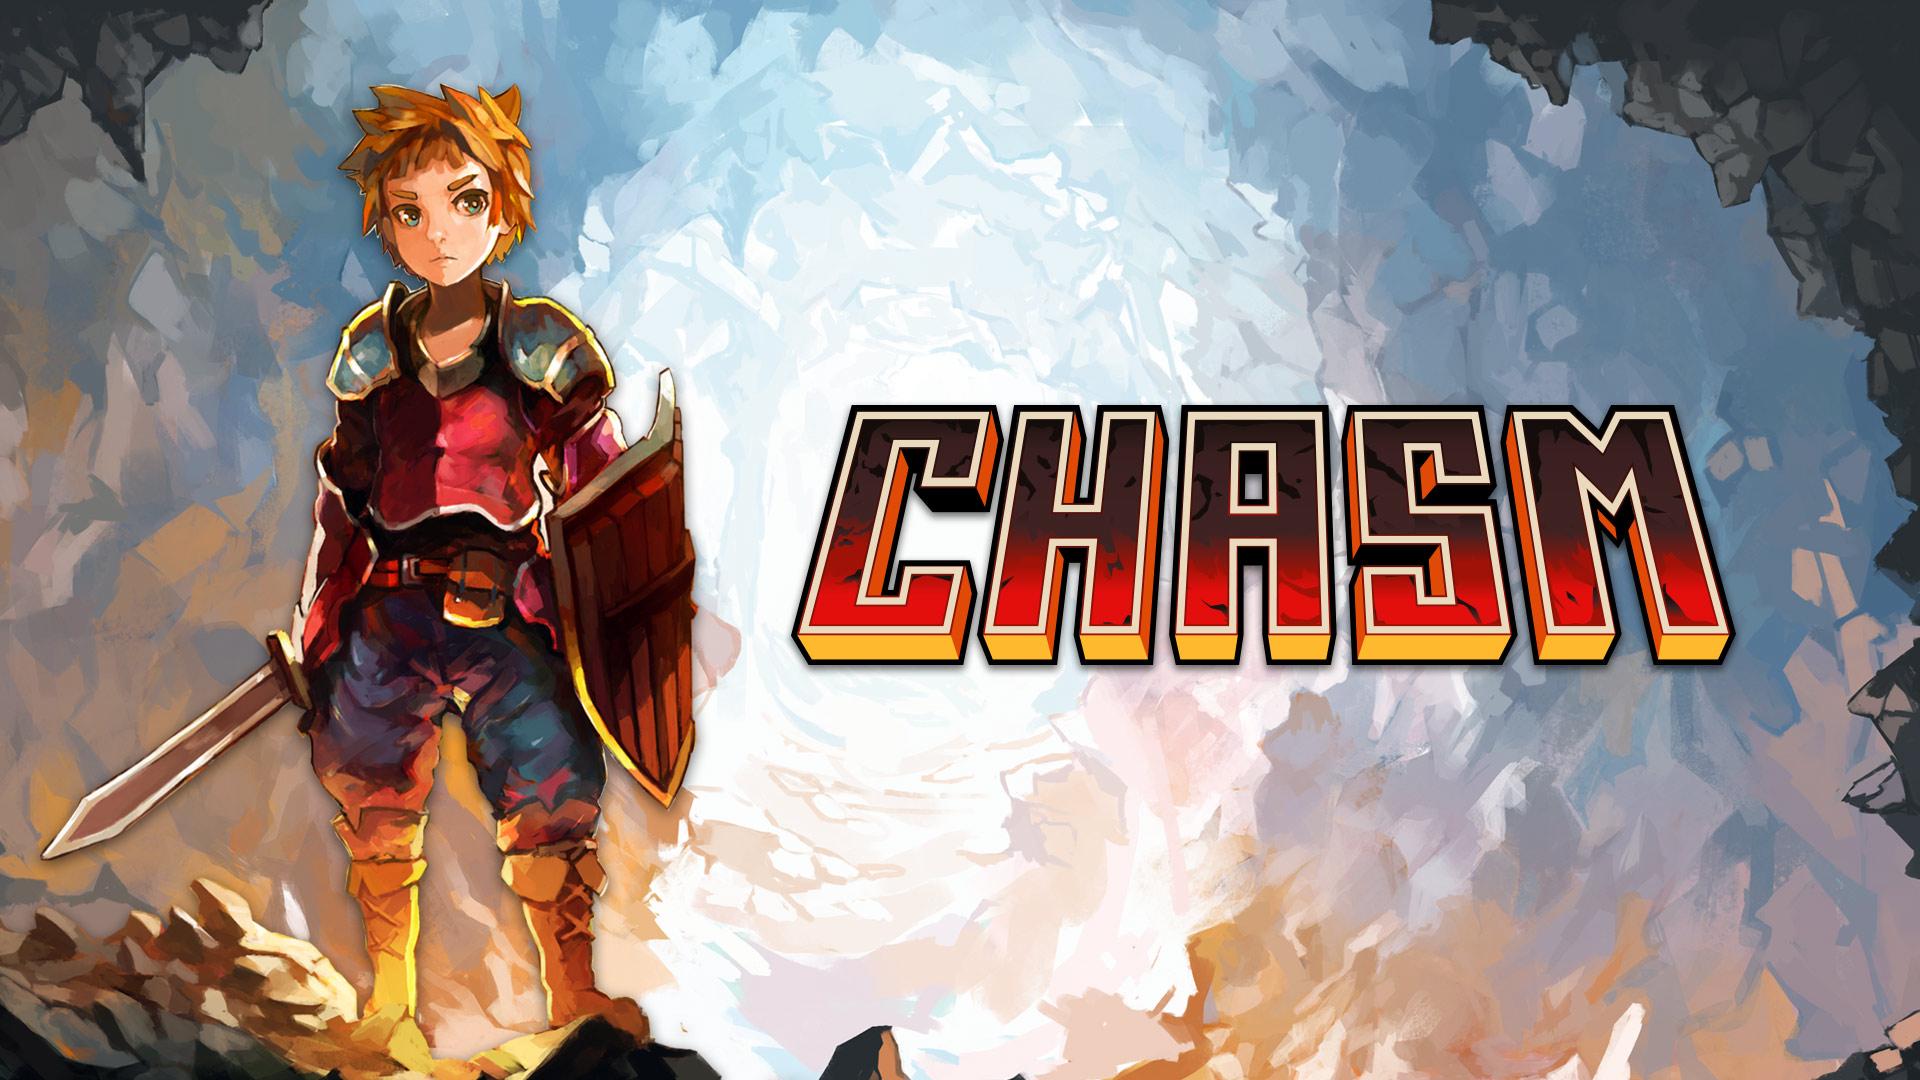 Chasm - Nintendo Switch Digital Download - $7.99 @ Nintendo Game Store